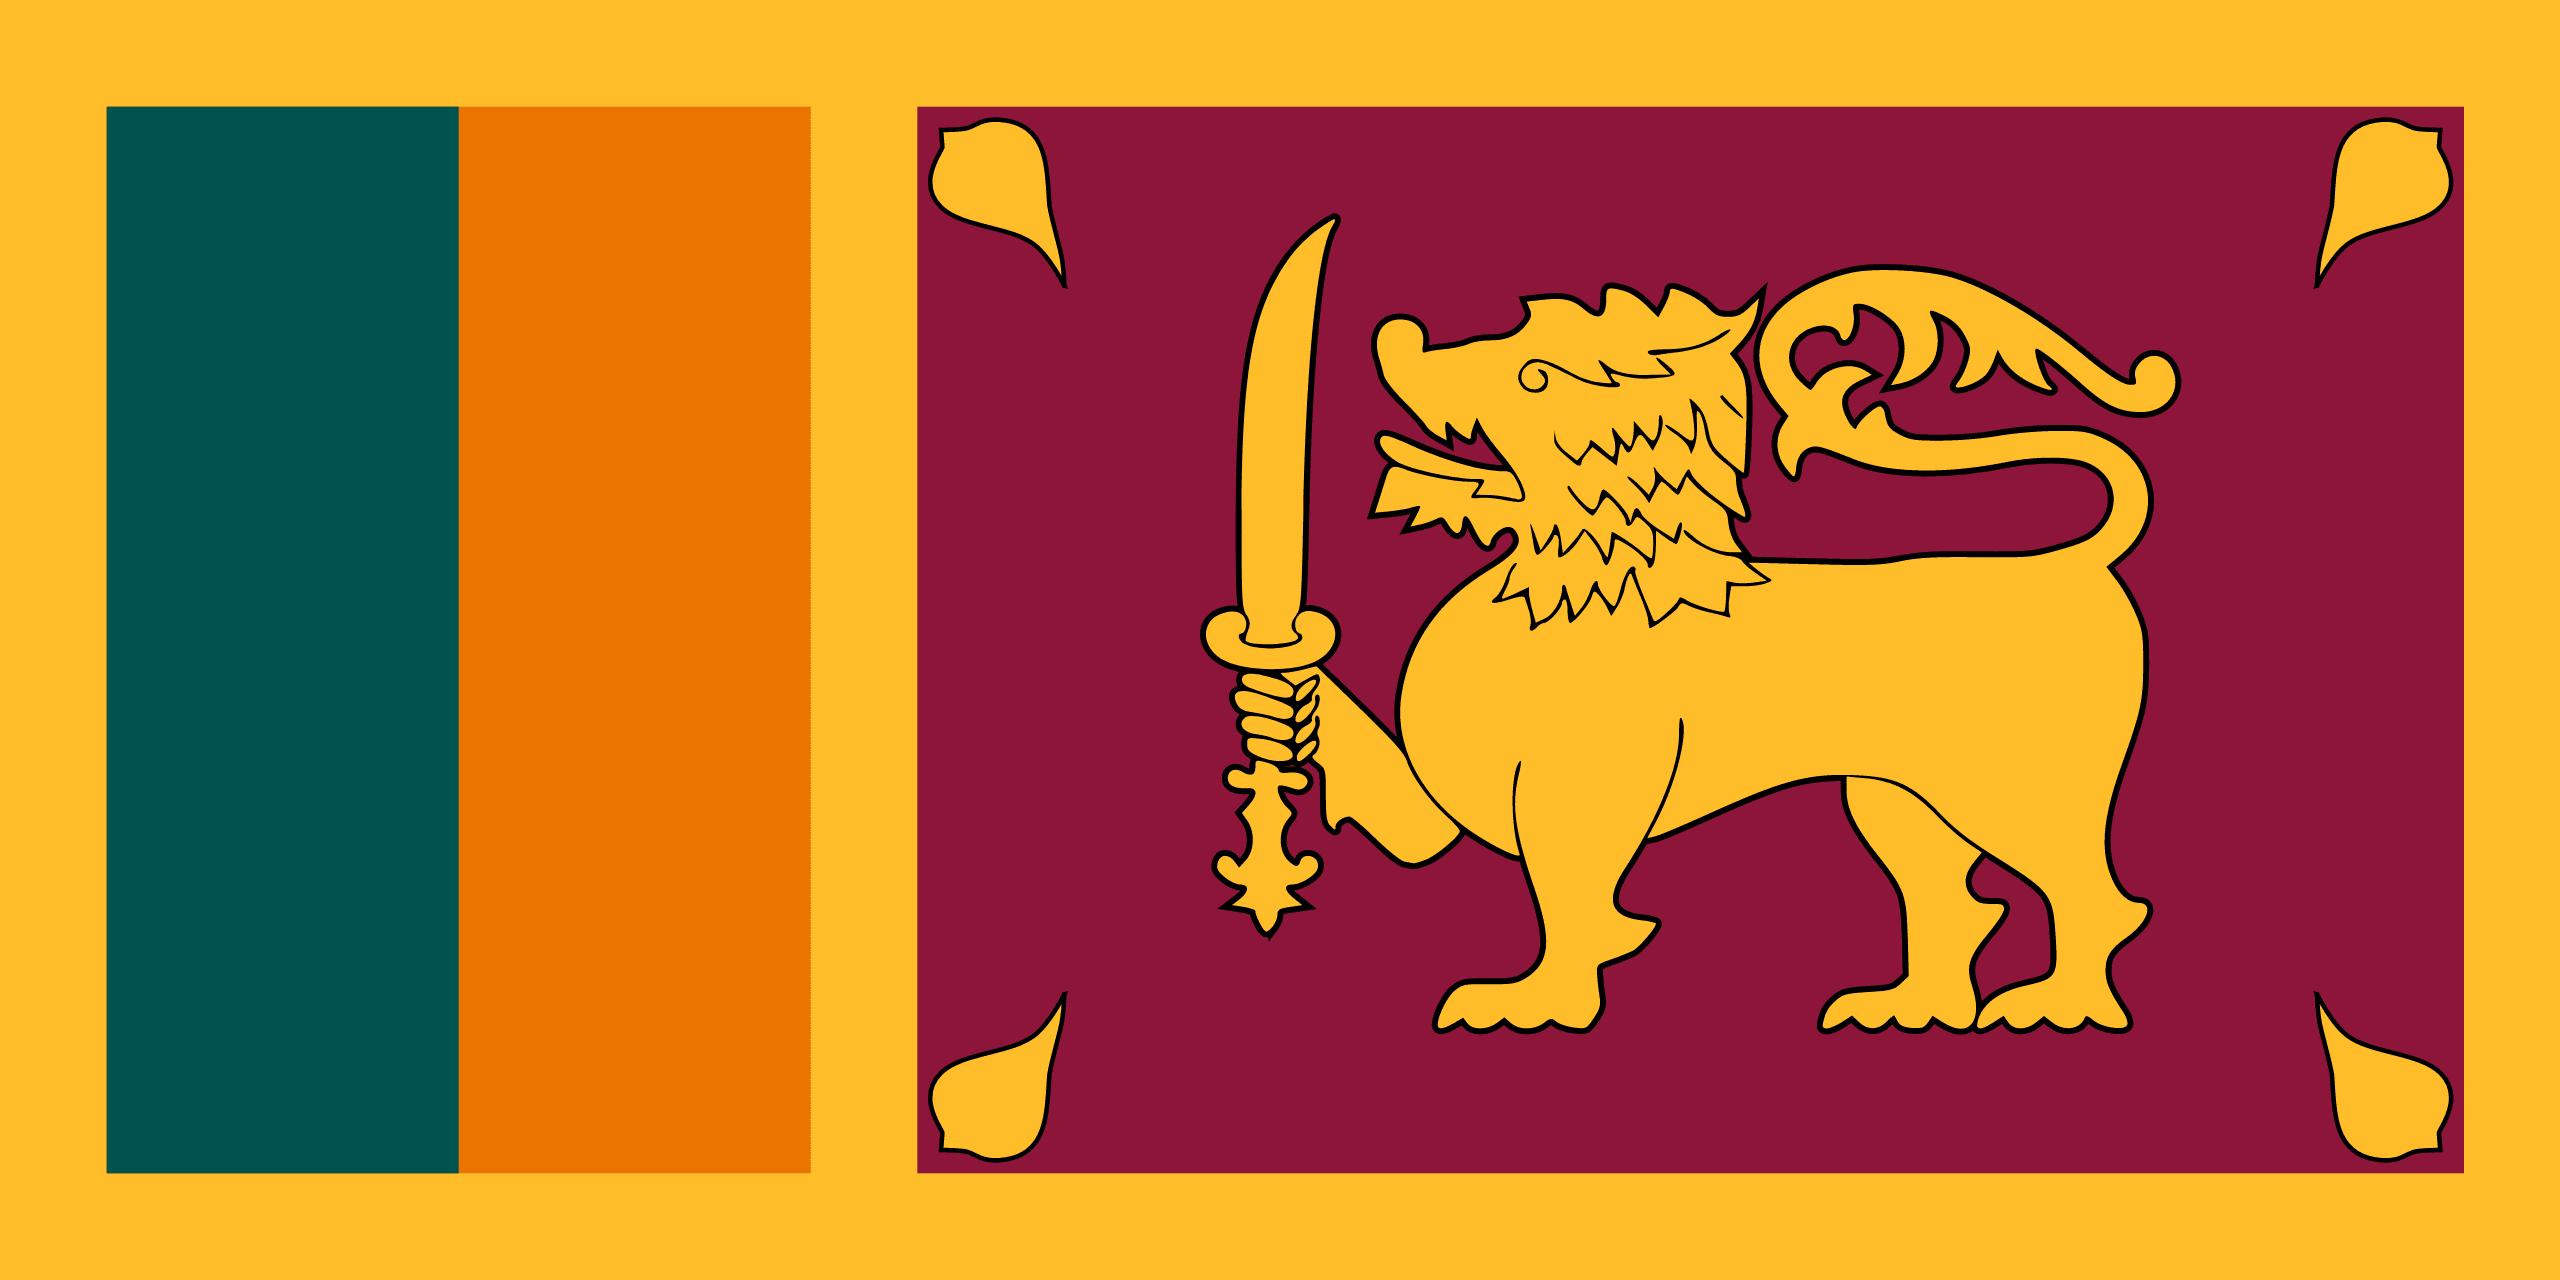 Illustration of Sri Lanka flag